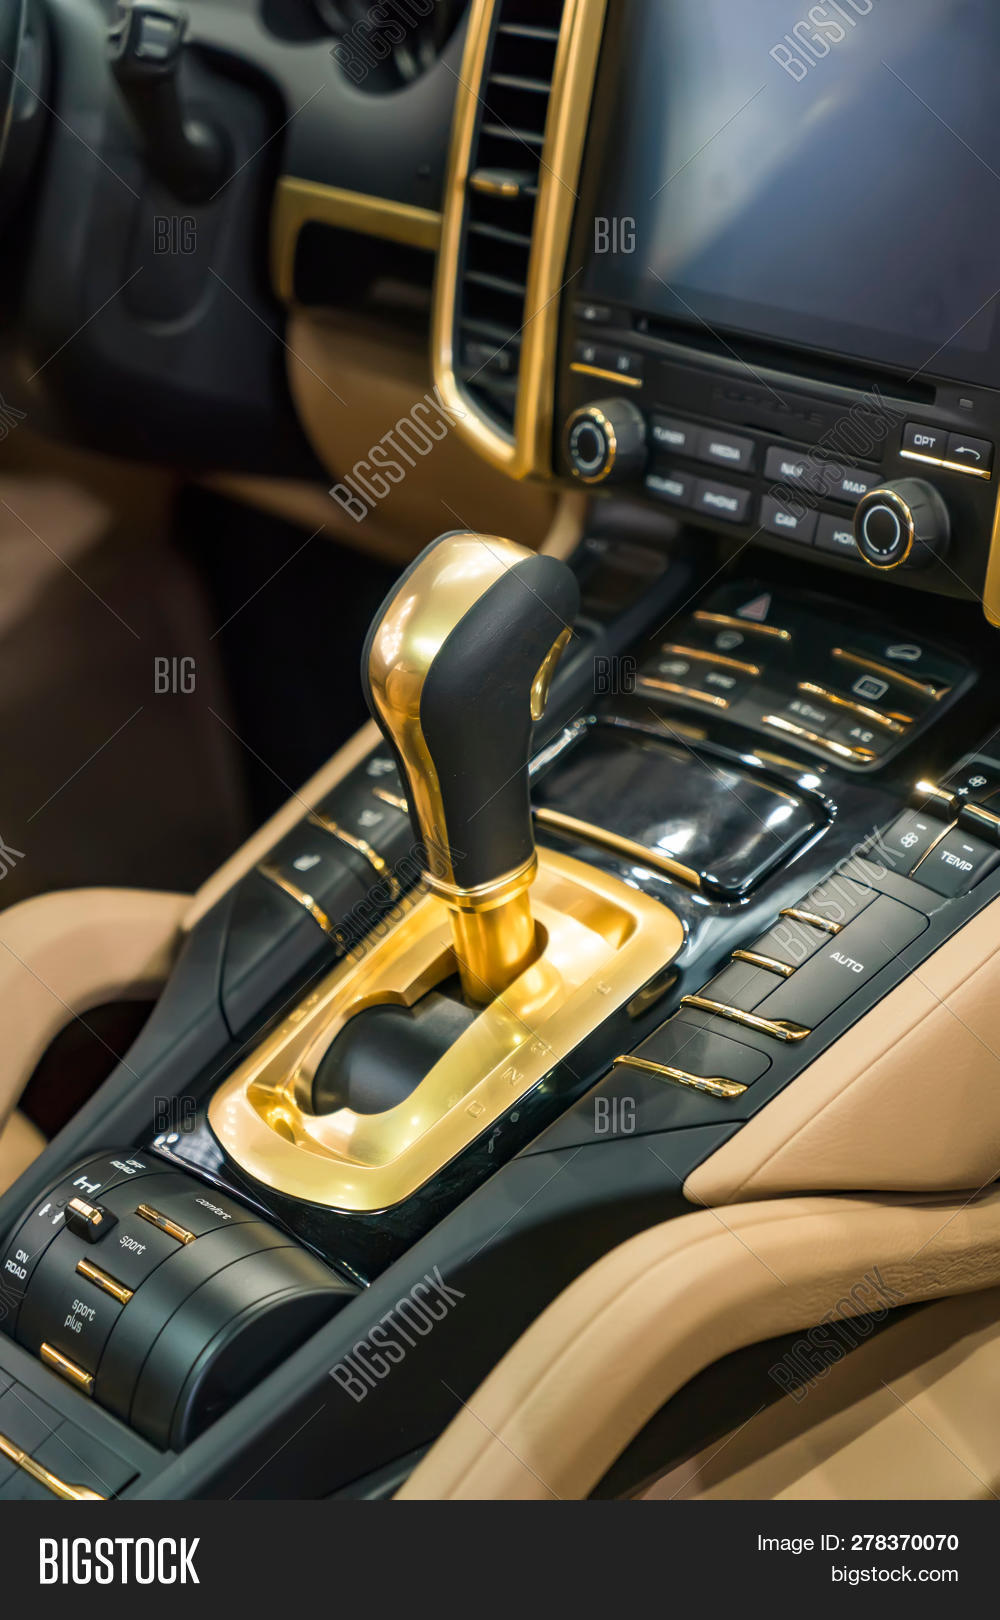 Modern Luxury Car Image & Photo (Free Trial) | Bigstock